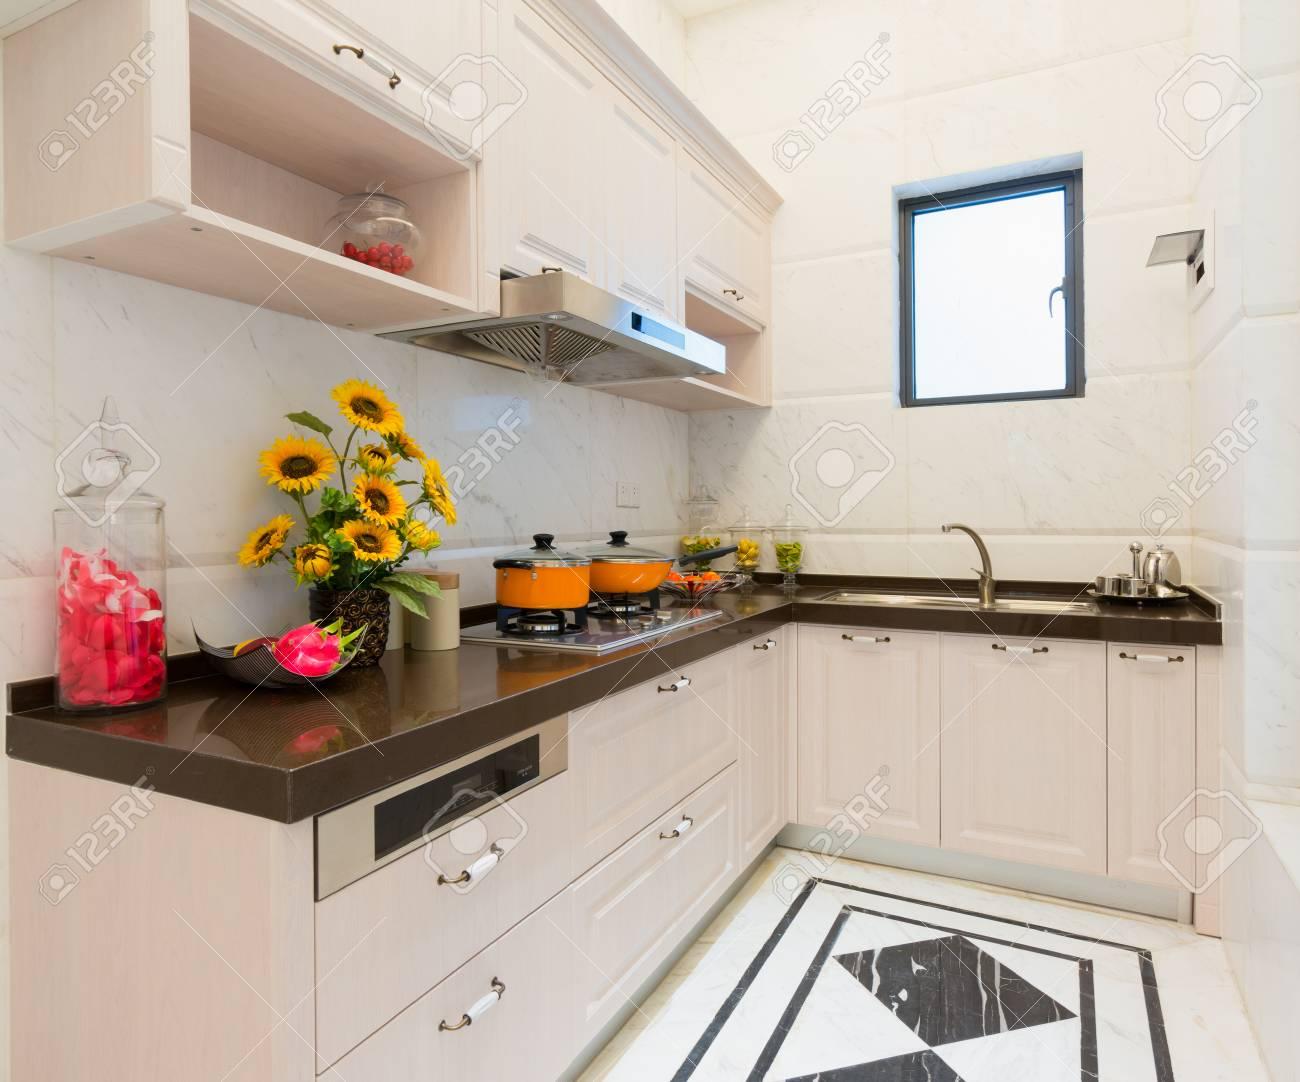 modern kitchen with nice decoration Stock Photo - 24283175